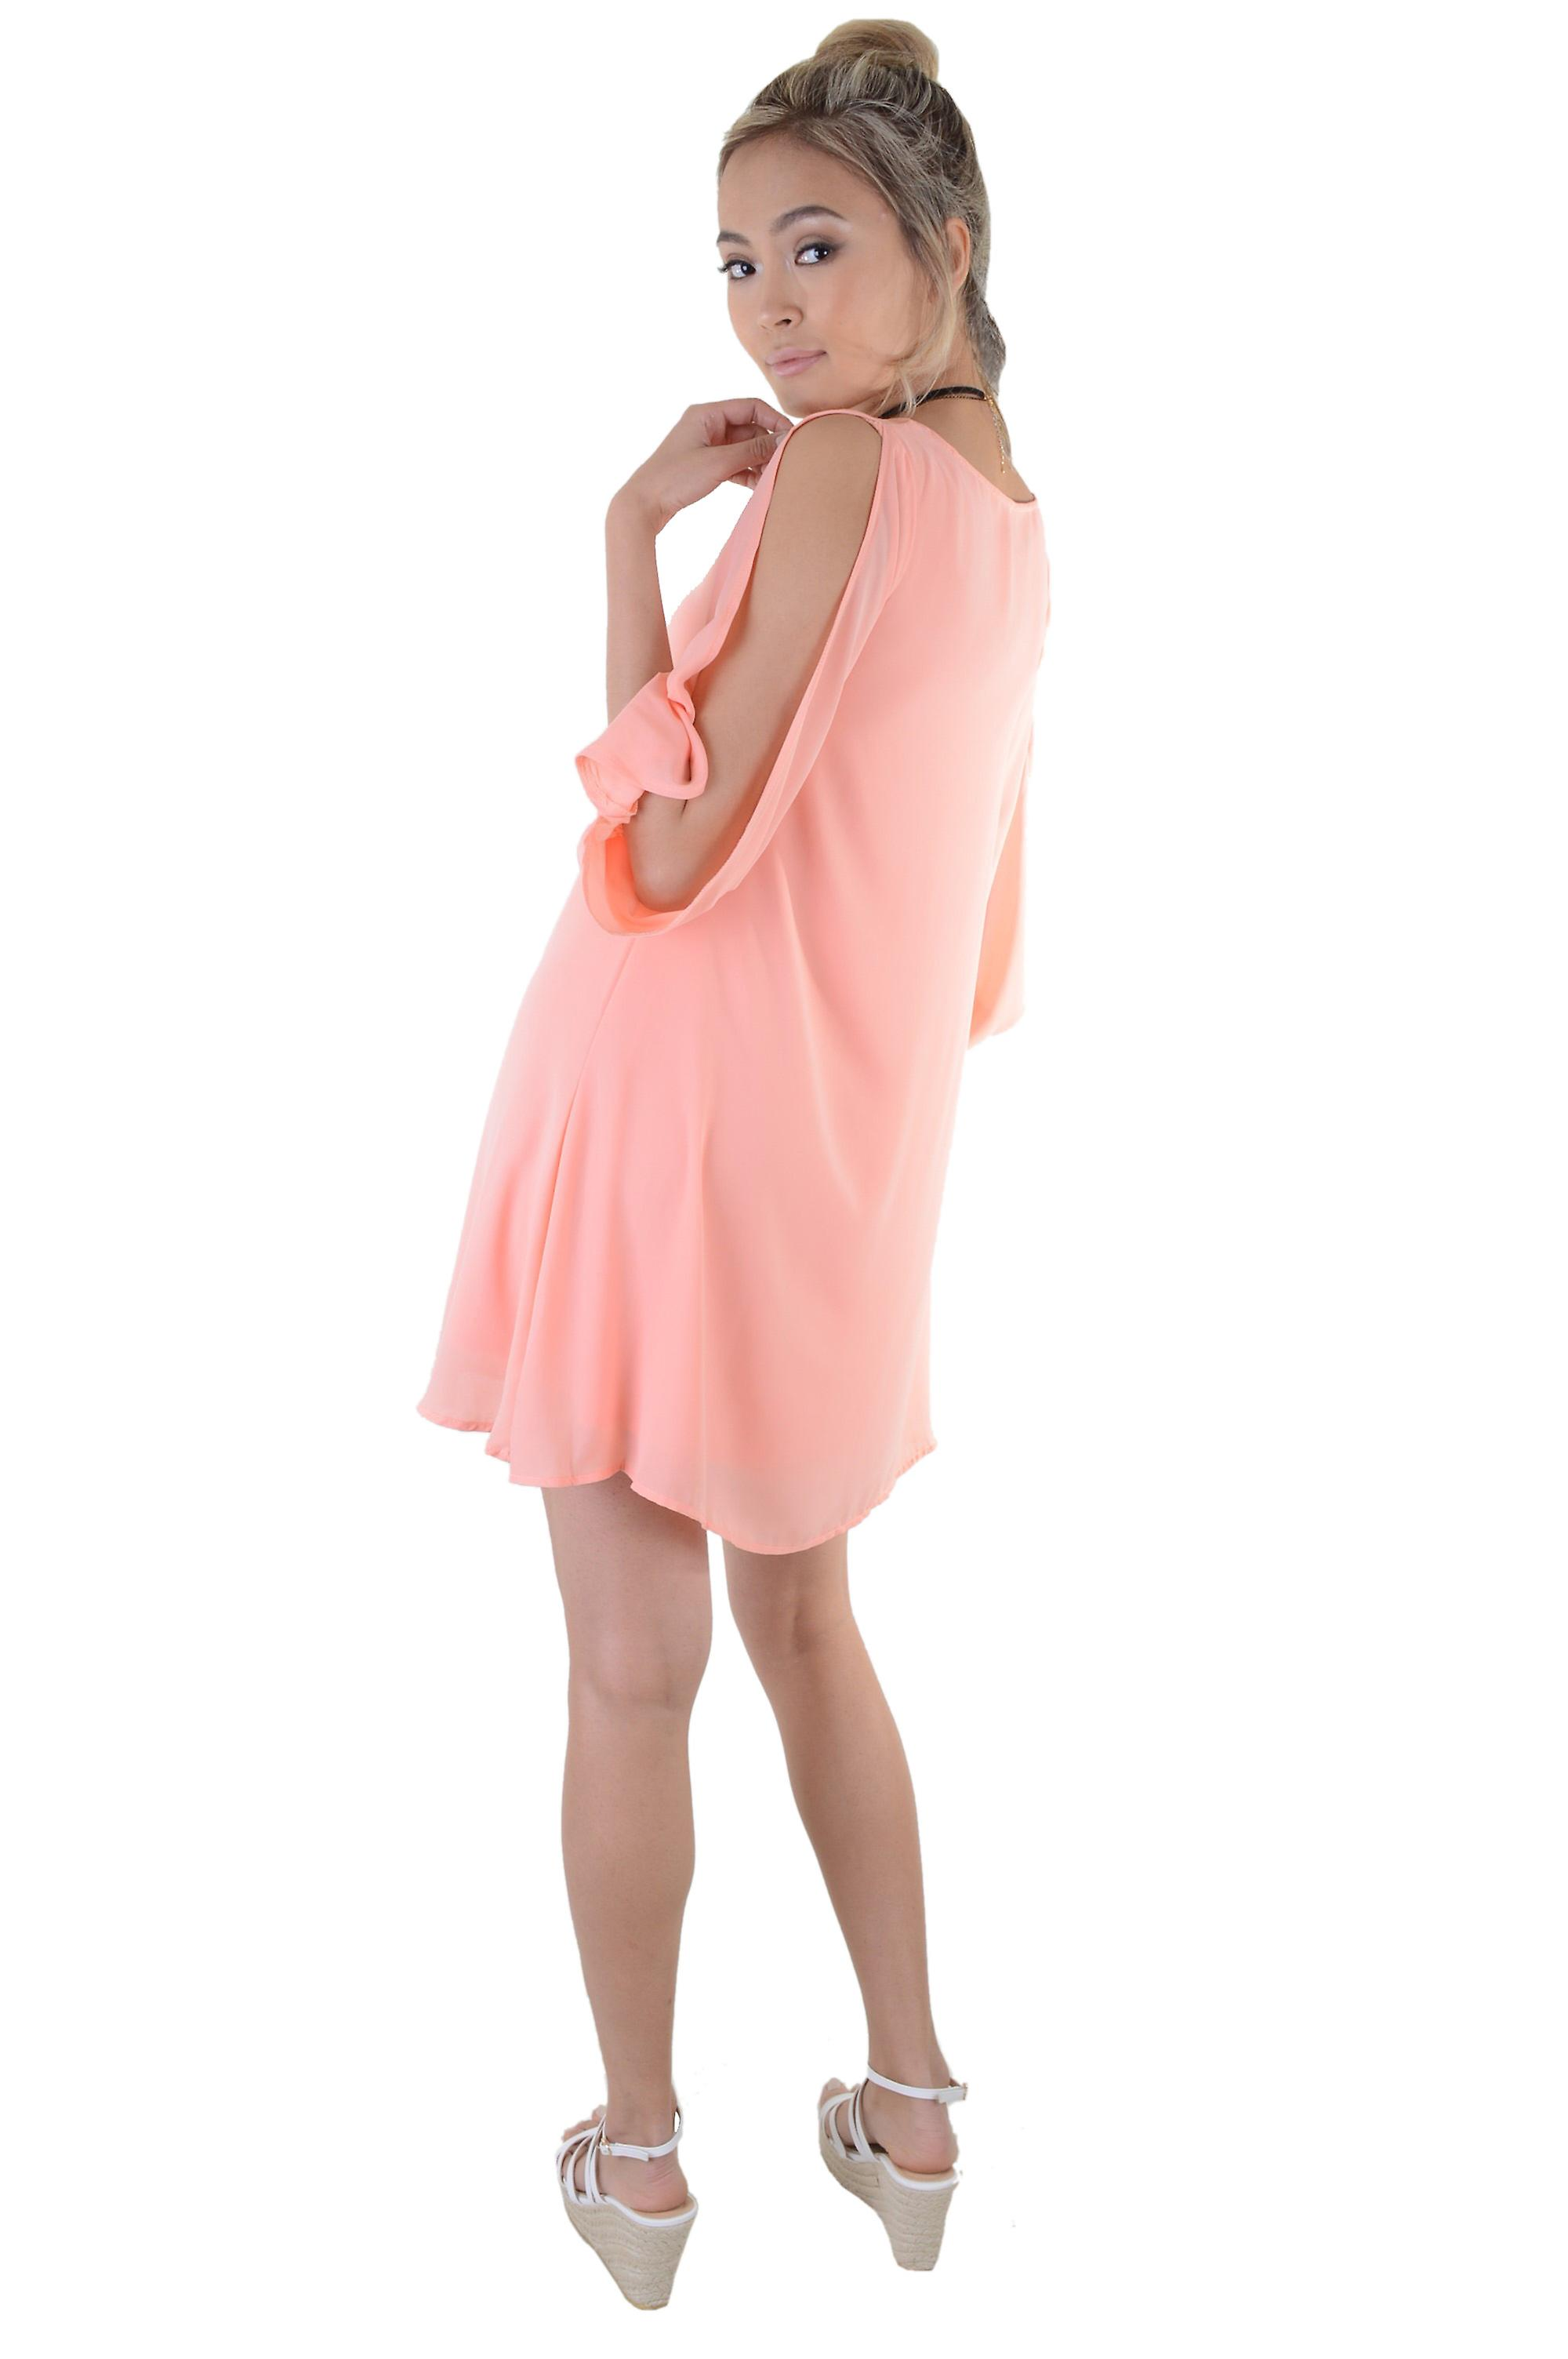 Lovemystyle Oversized Balloon Sleeve Bright Pink Dress - SAMPLE